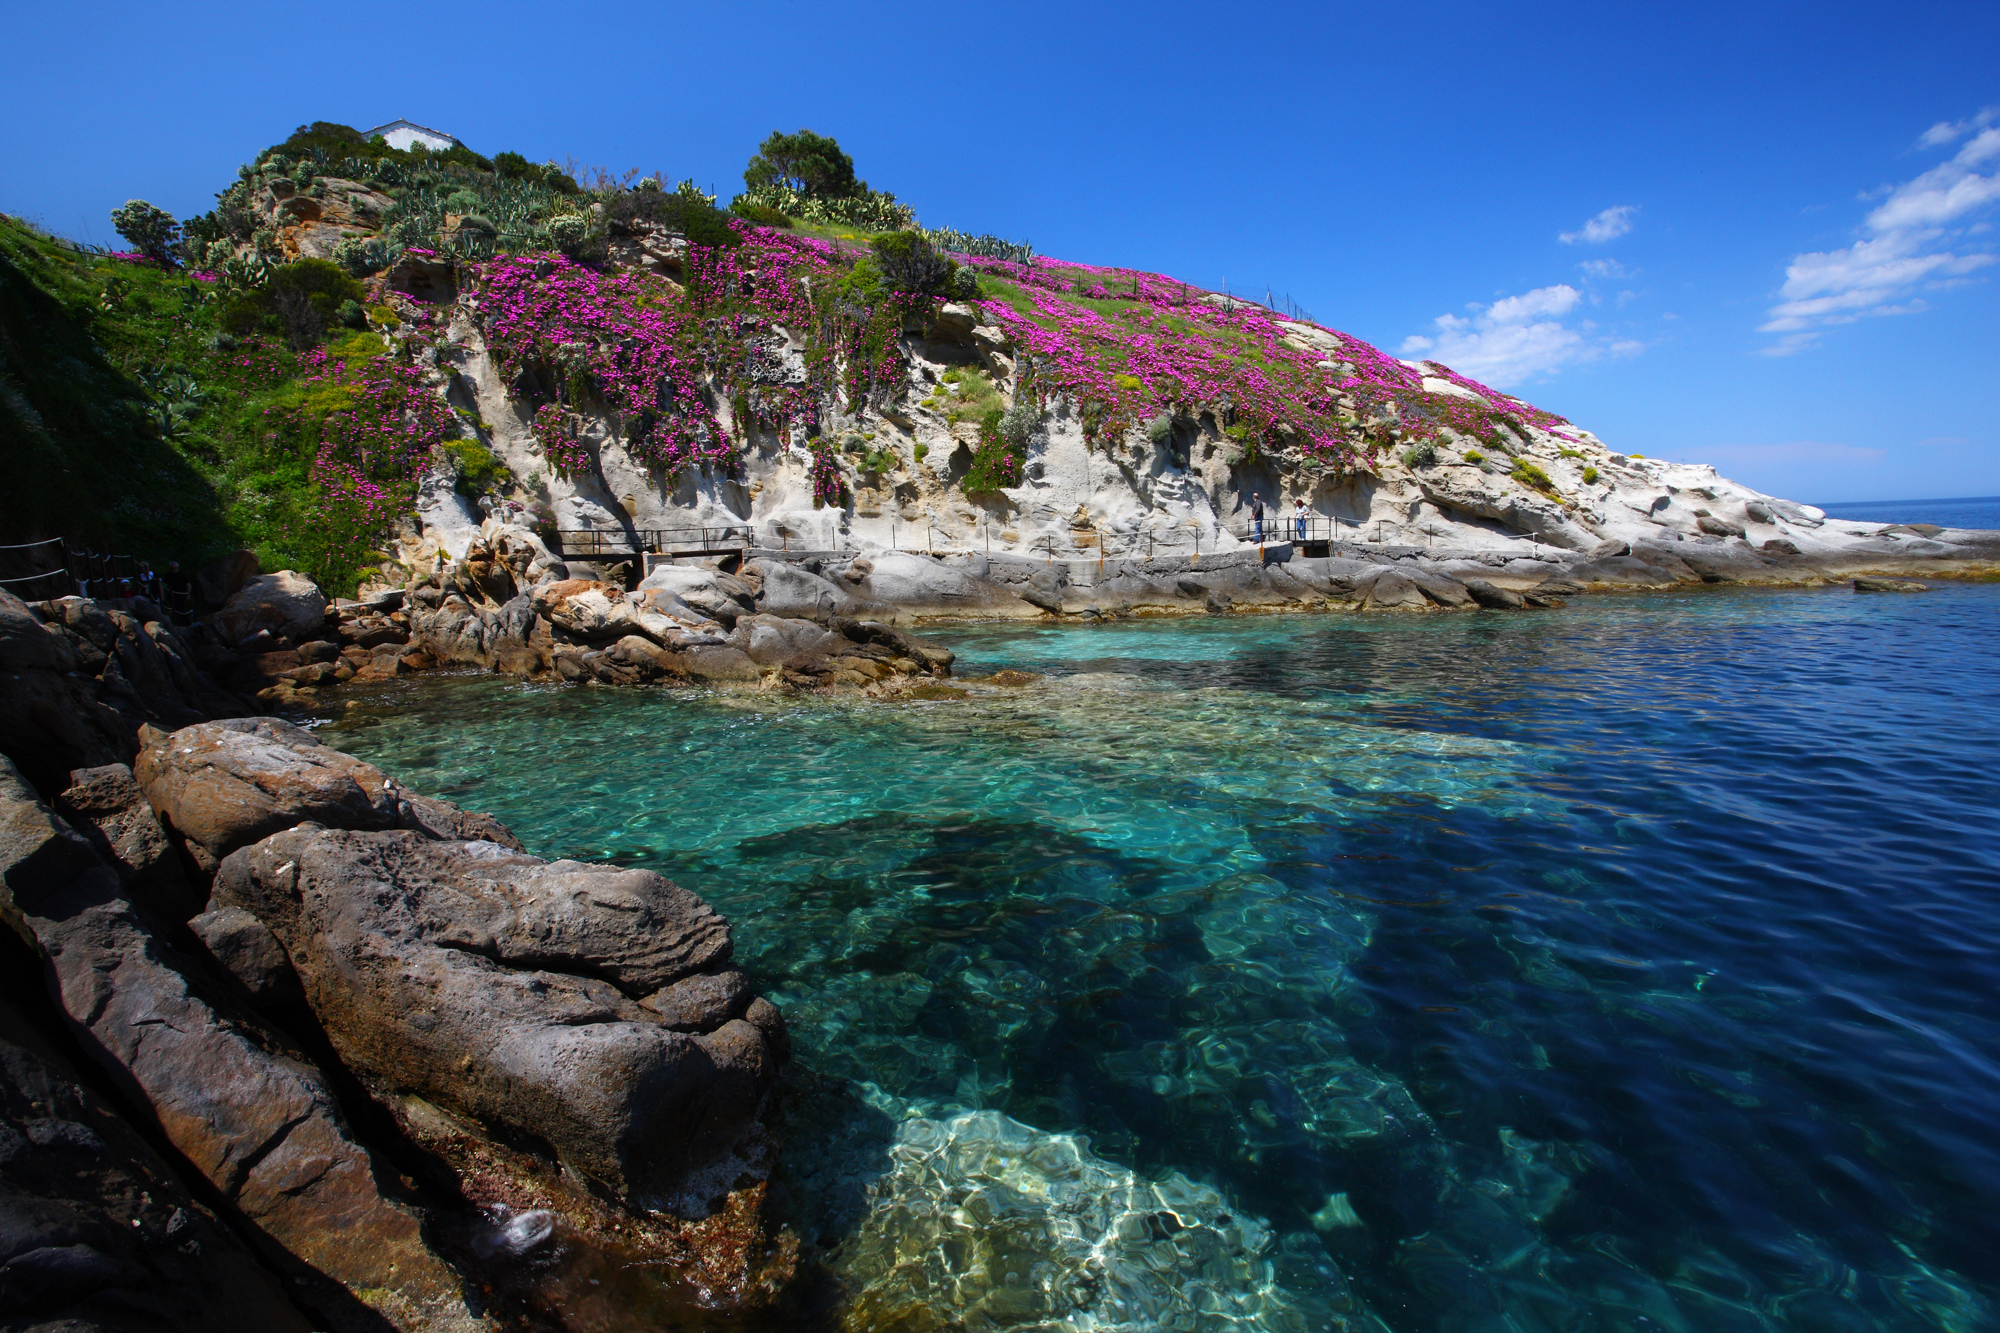 Visit Elba Island Tuscany Tourism Natural Set Design S. Andrea